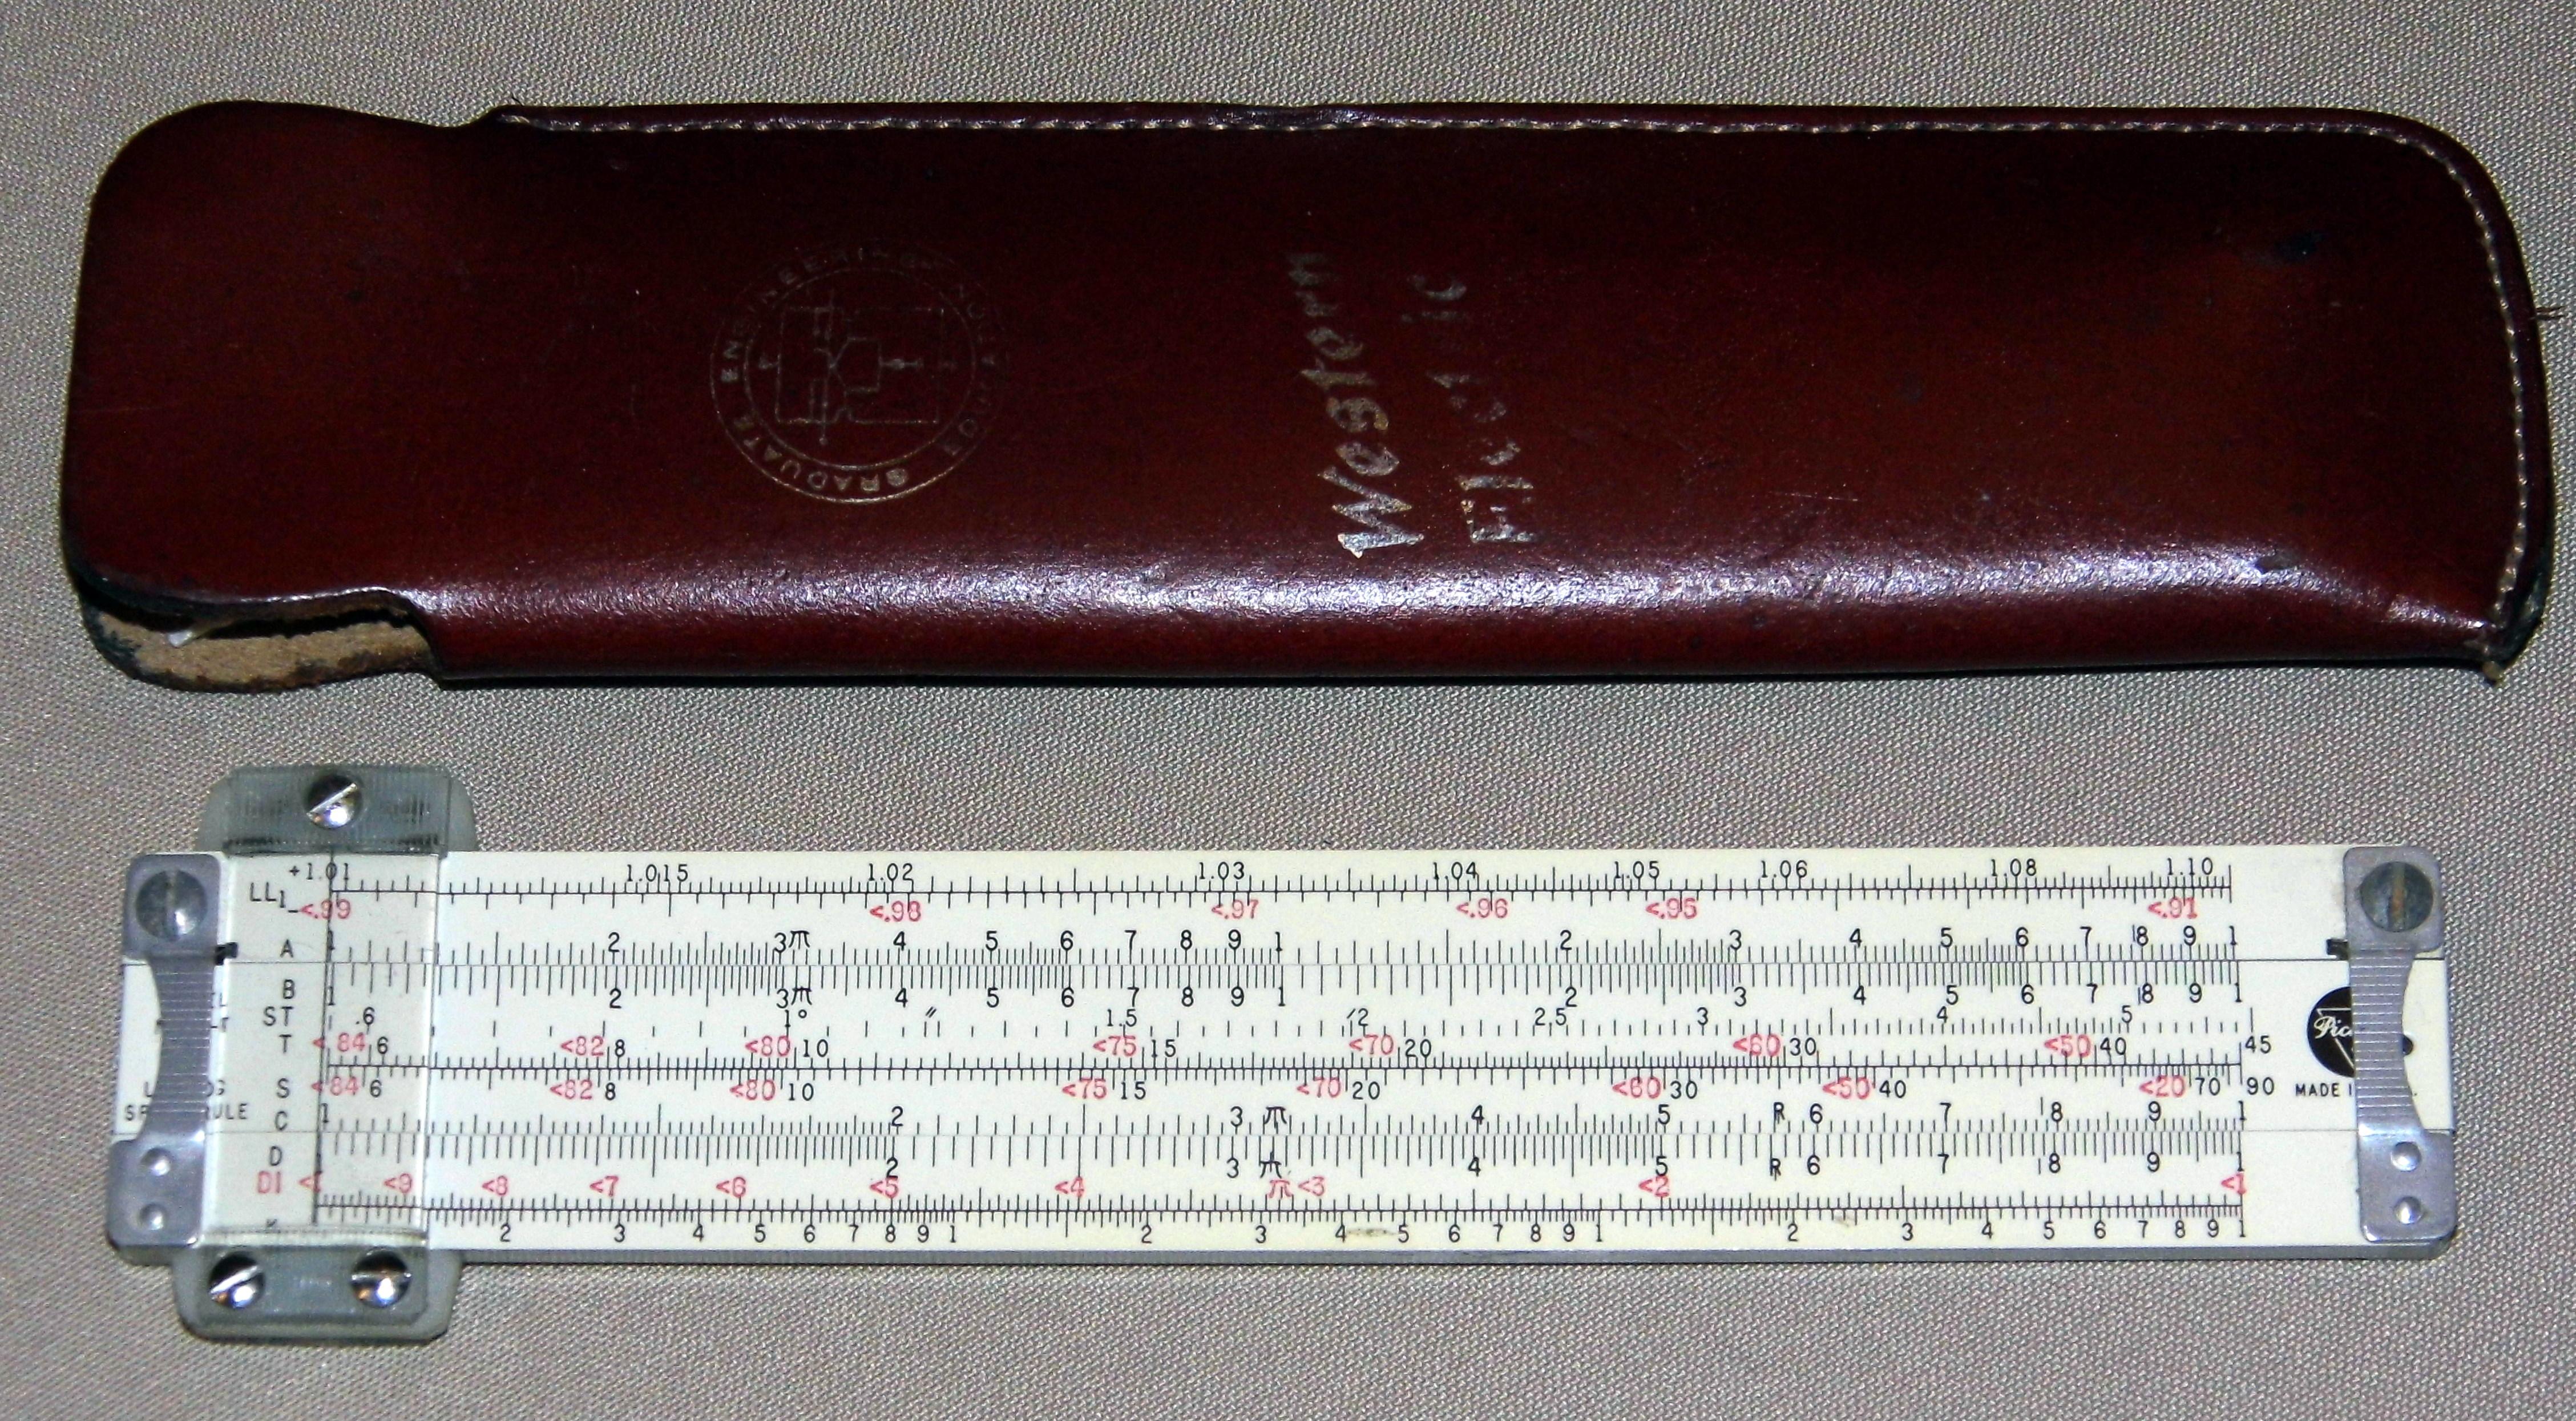 File:Vintage 6-Inch Pickett Slide Rule, Model N600-T with ...